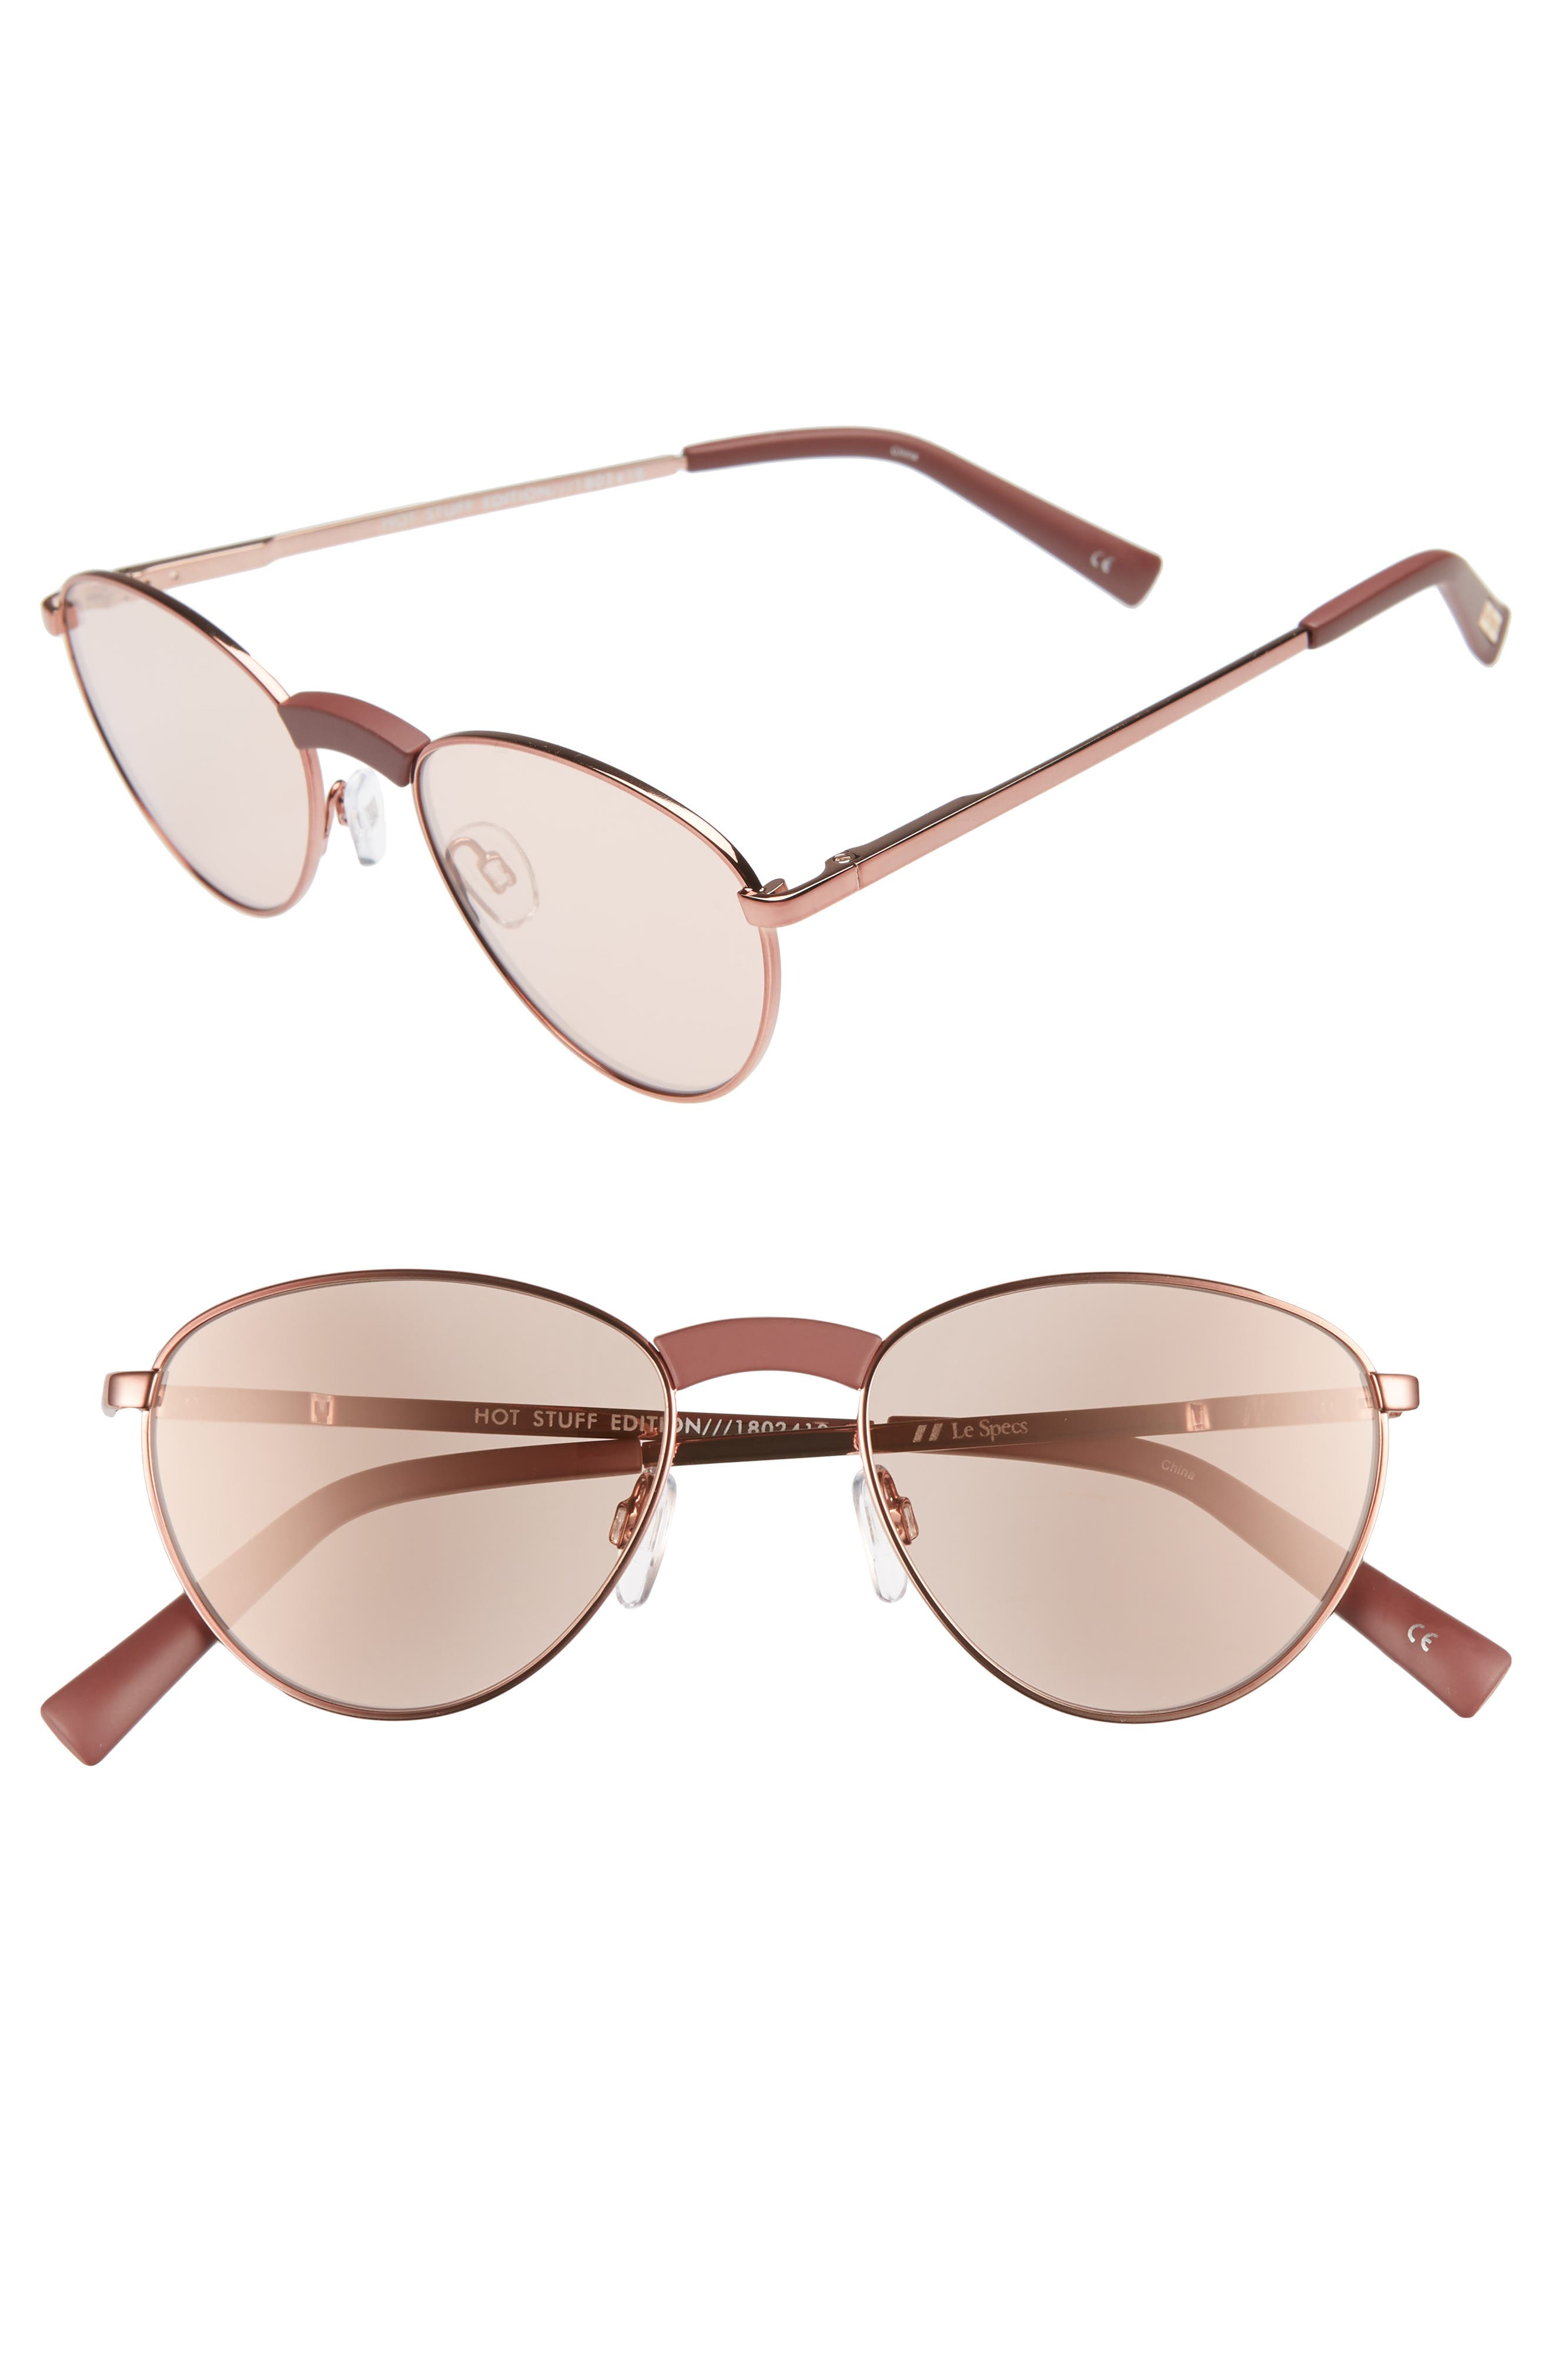 Hot Stuff 52mm Sunglasses,                             Main thumbnail 1, color,                             200